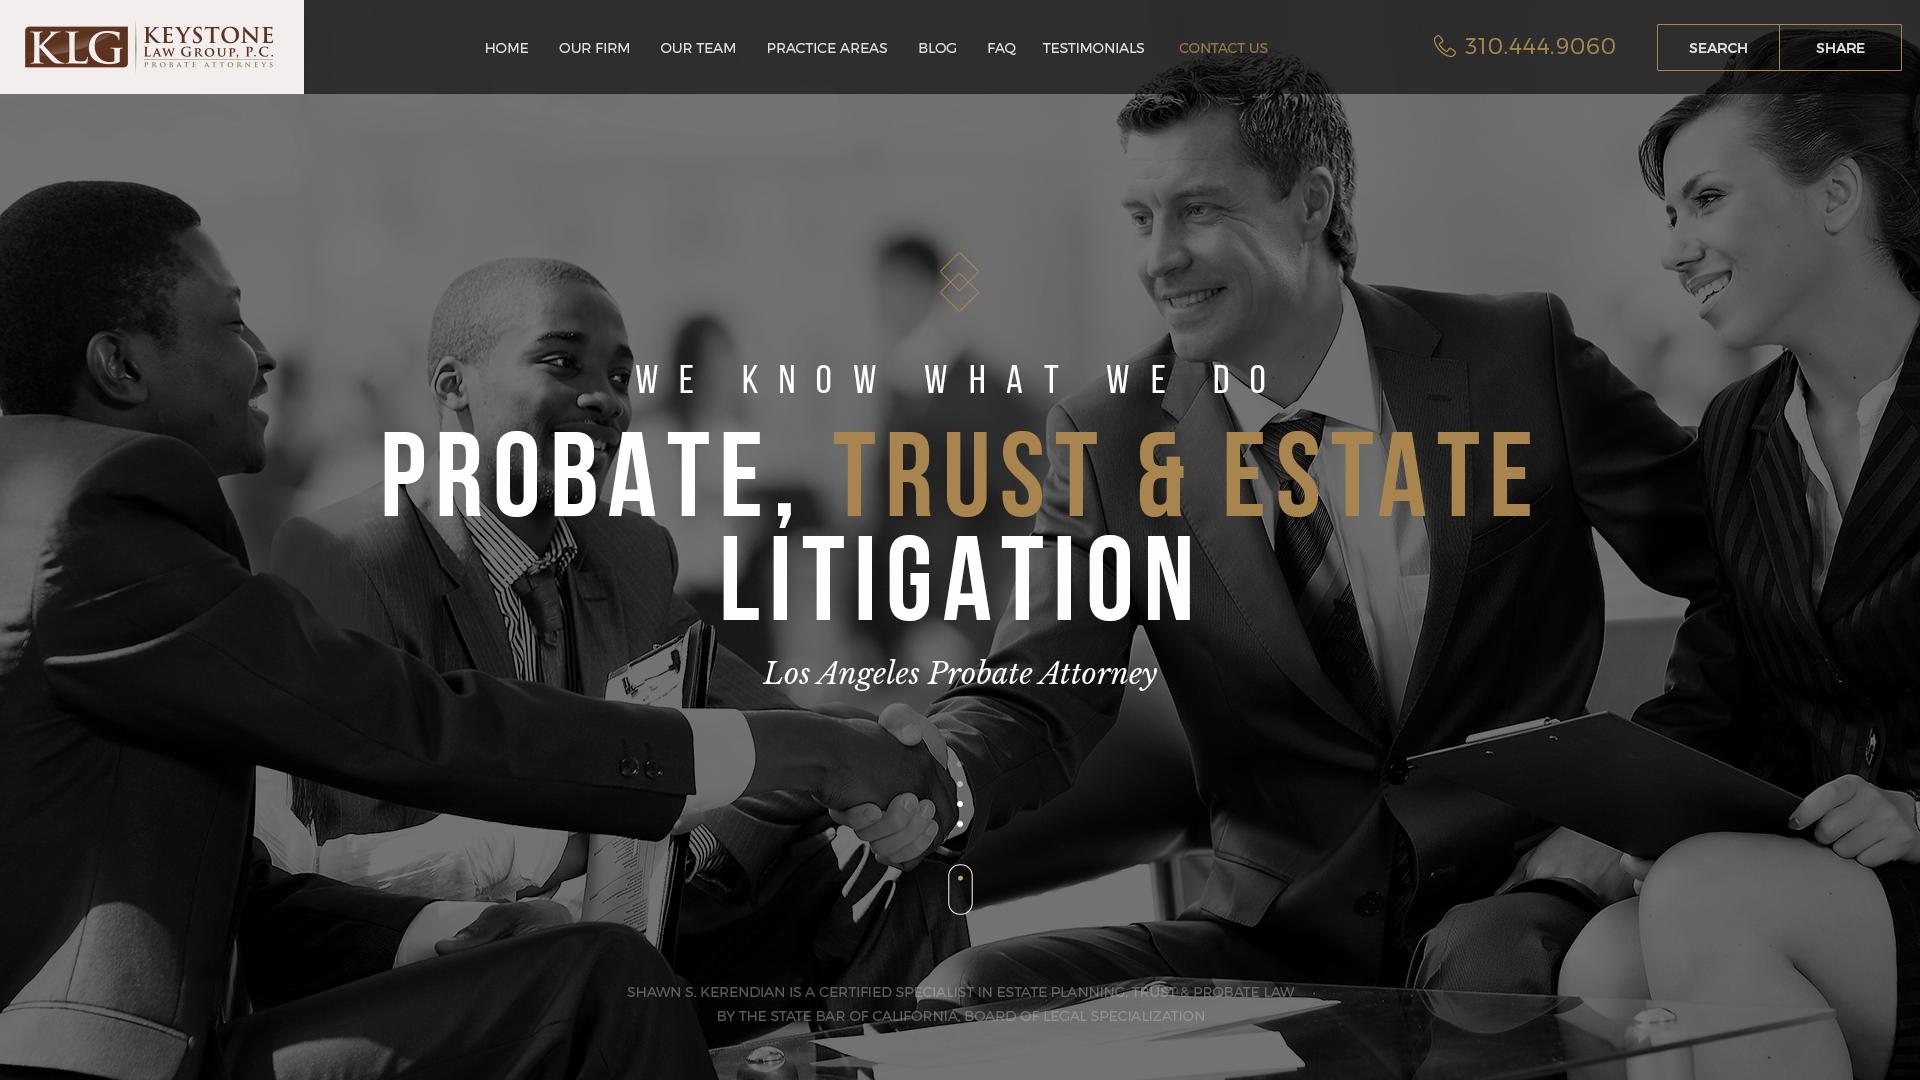 Keystone Website Design Preview